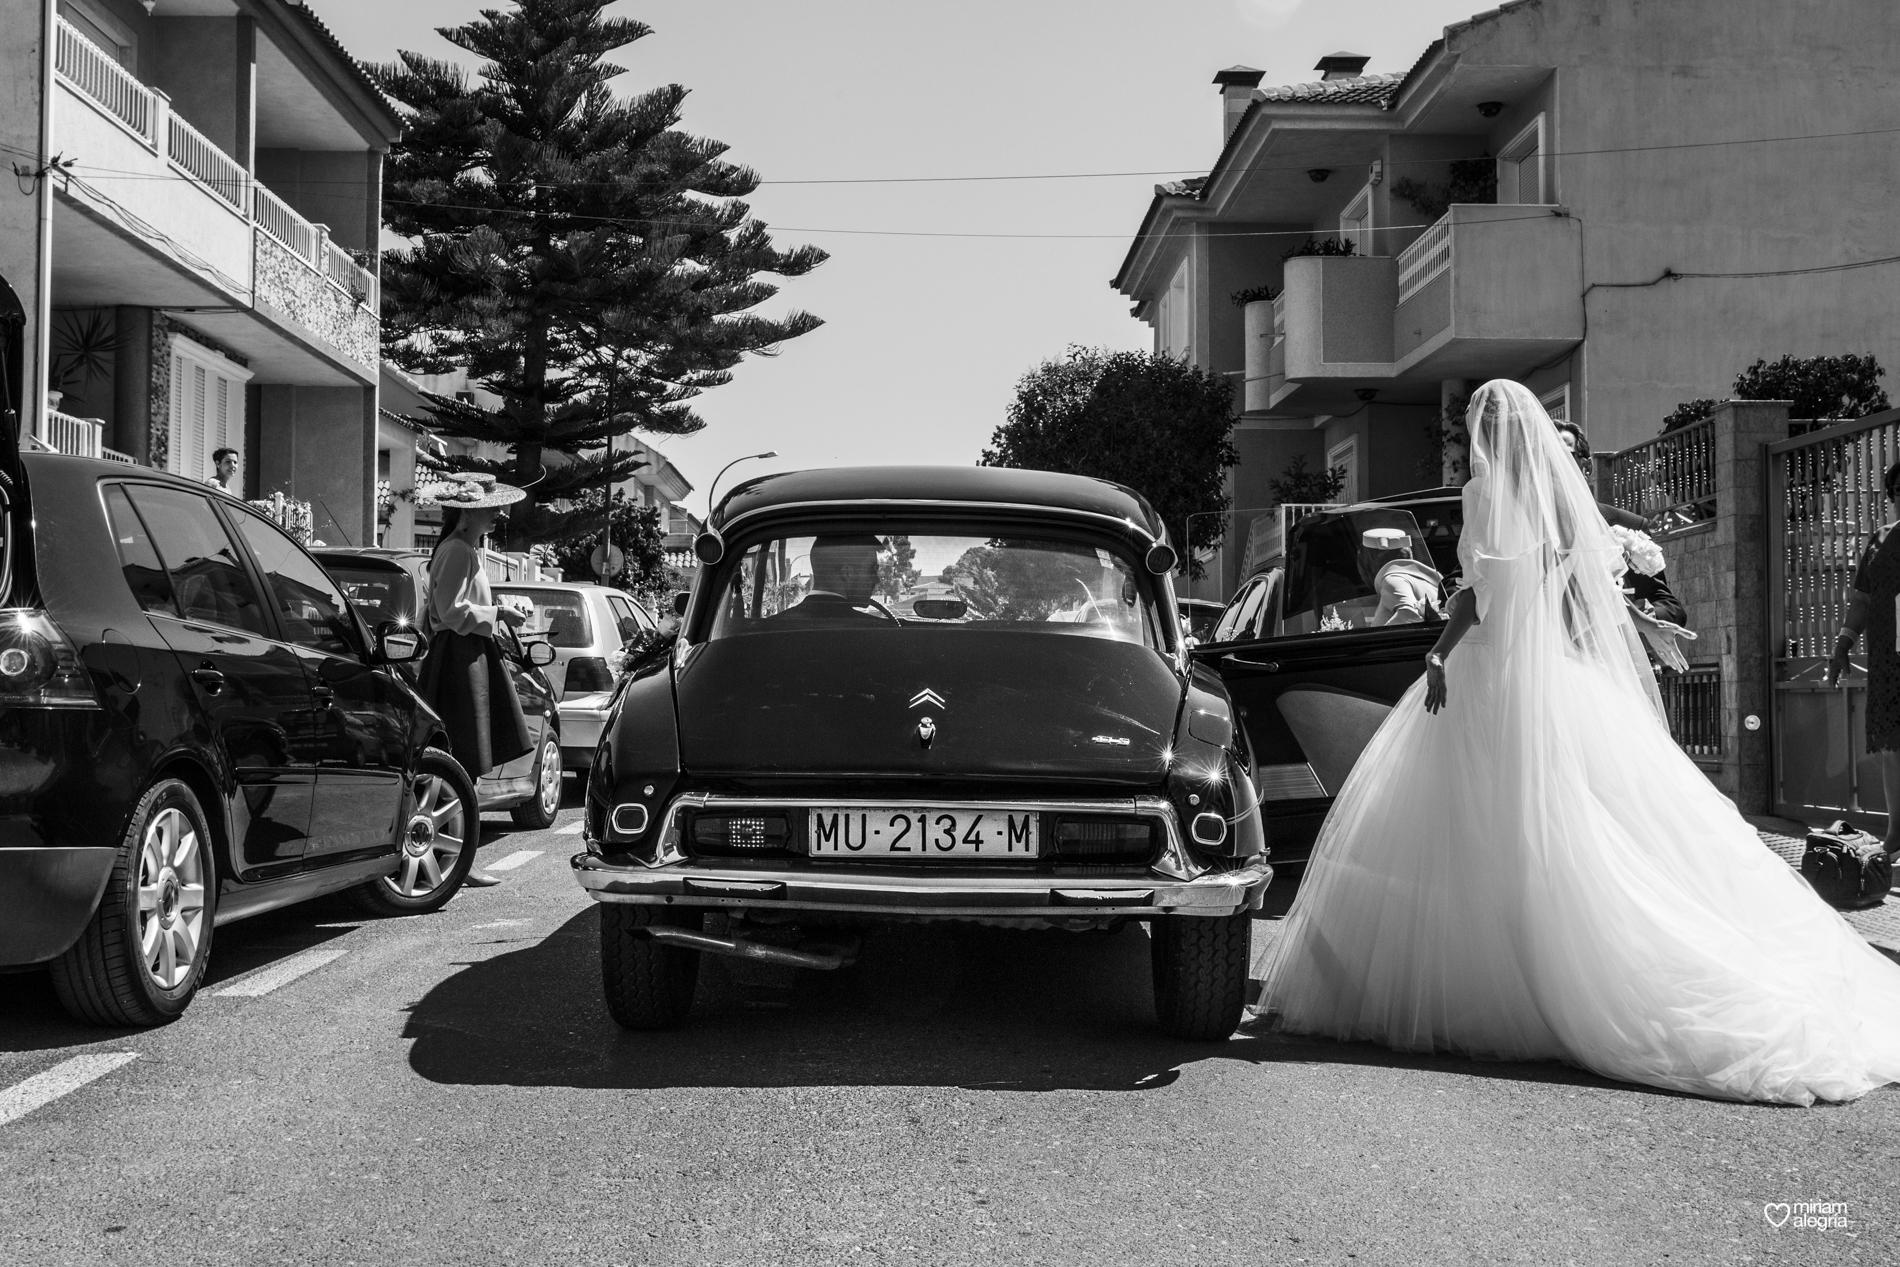 boda-en-la-catedral-de-murcia-miriam-alegria-fotografos-boda-murcia-32